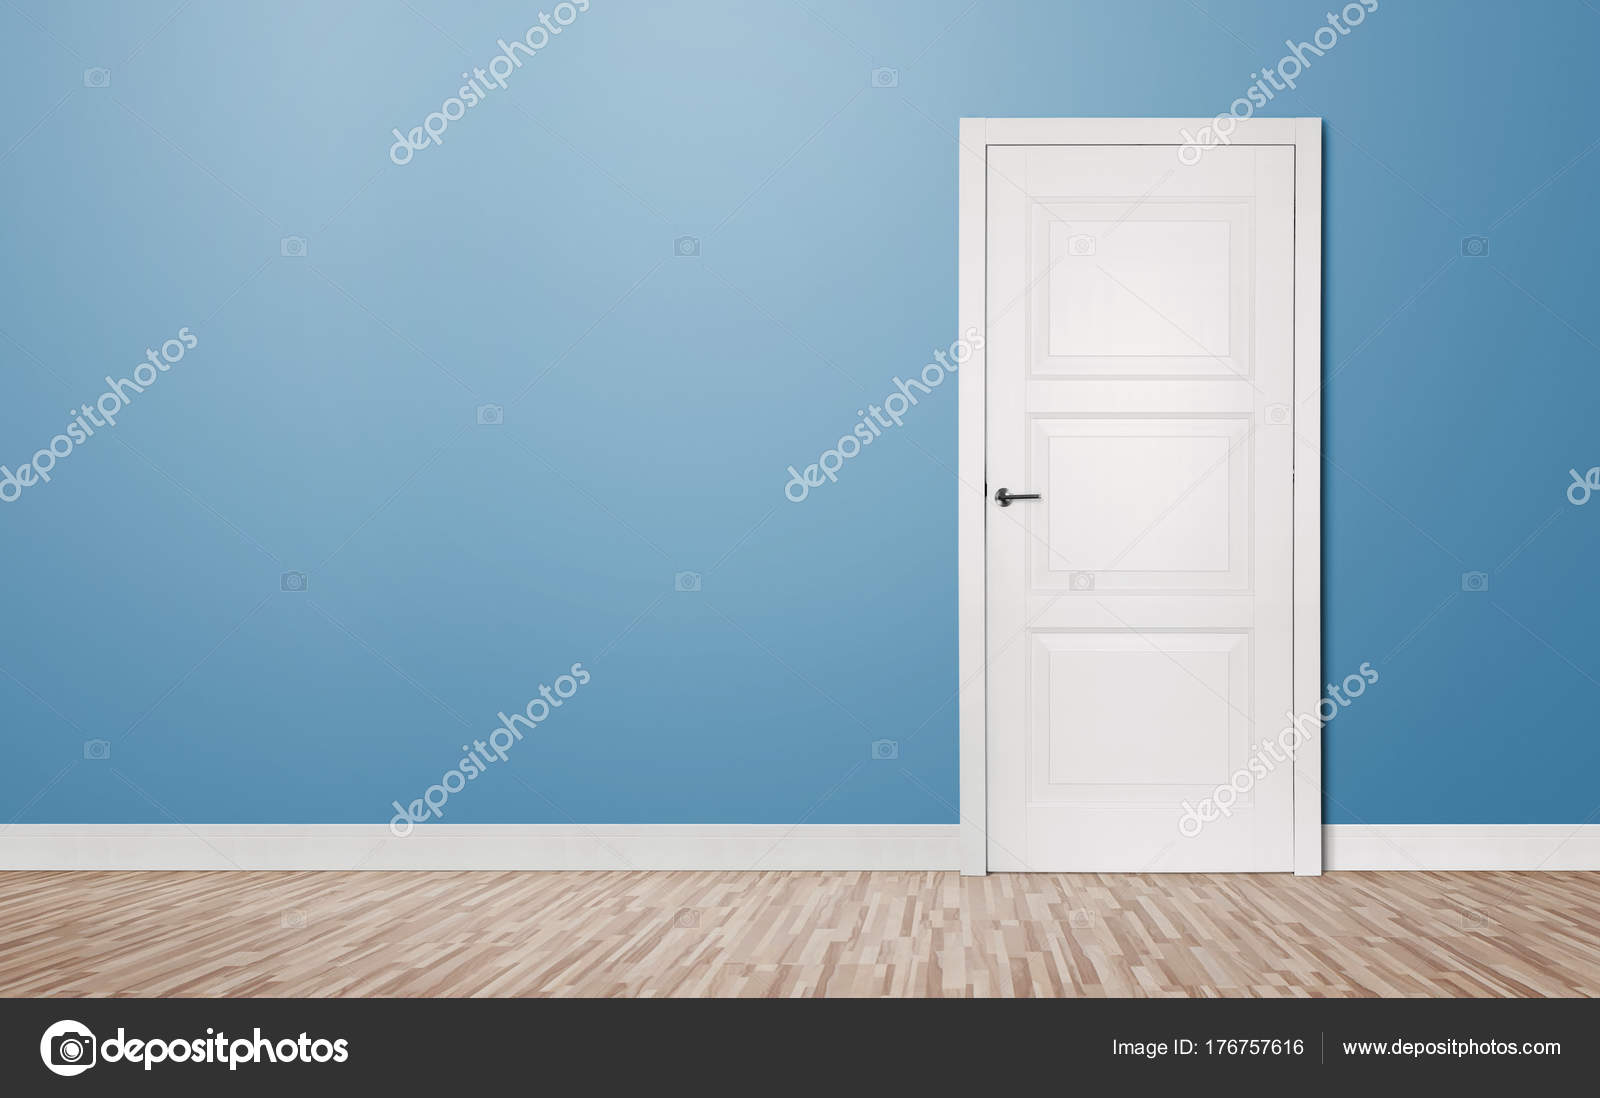 Vide In Huis : Huis clos dans la salle vide u2014 photographie rangizzz © #176757616